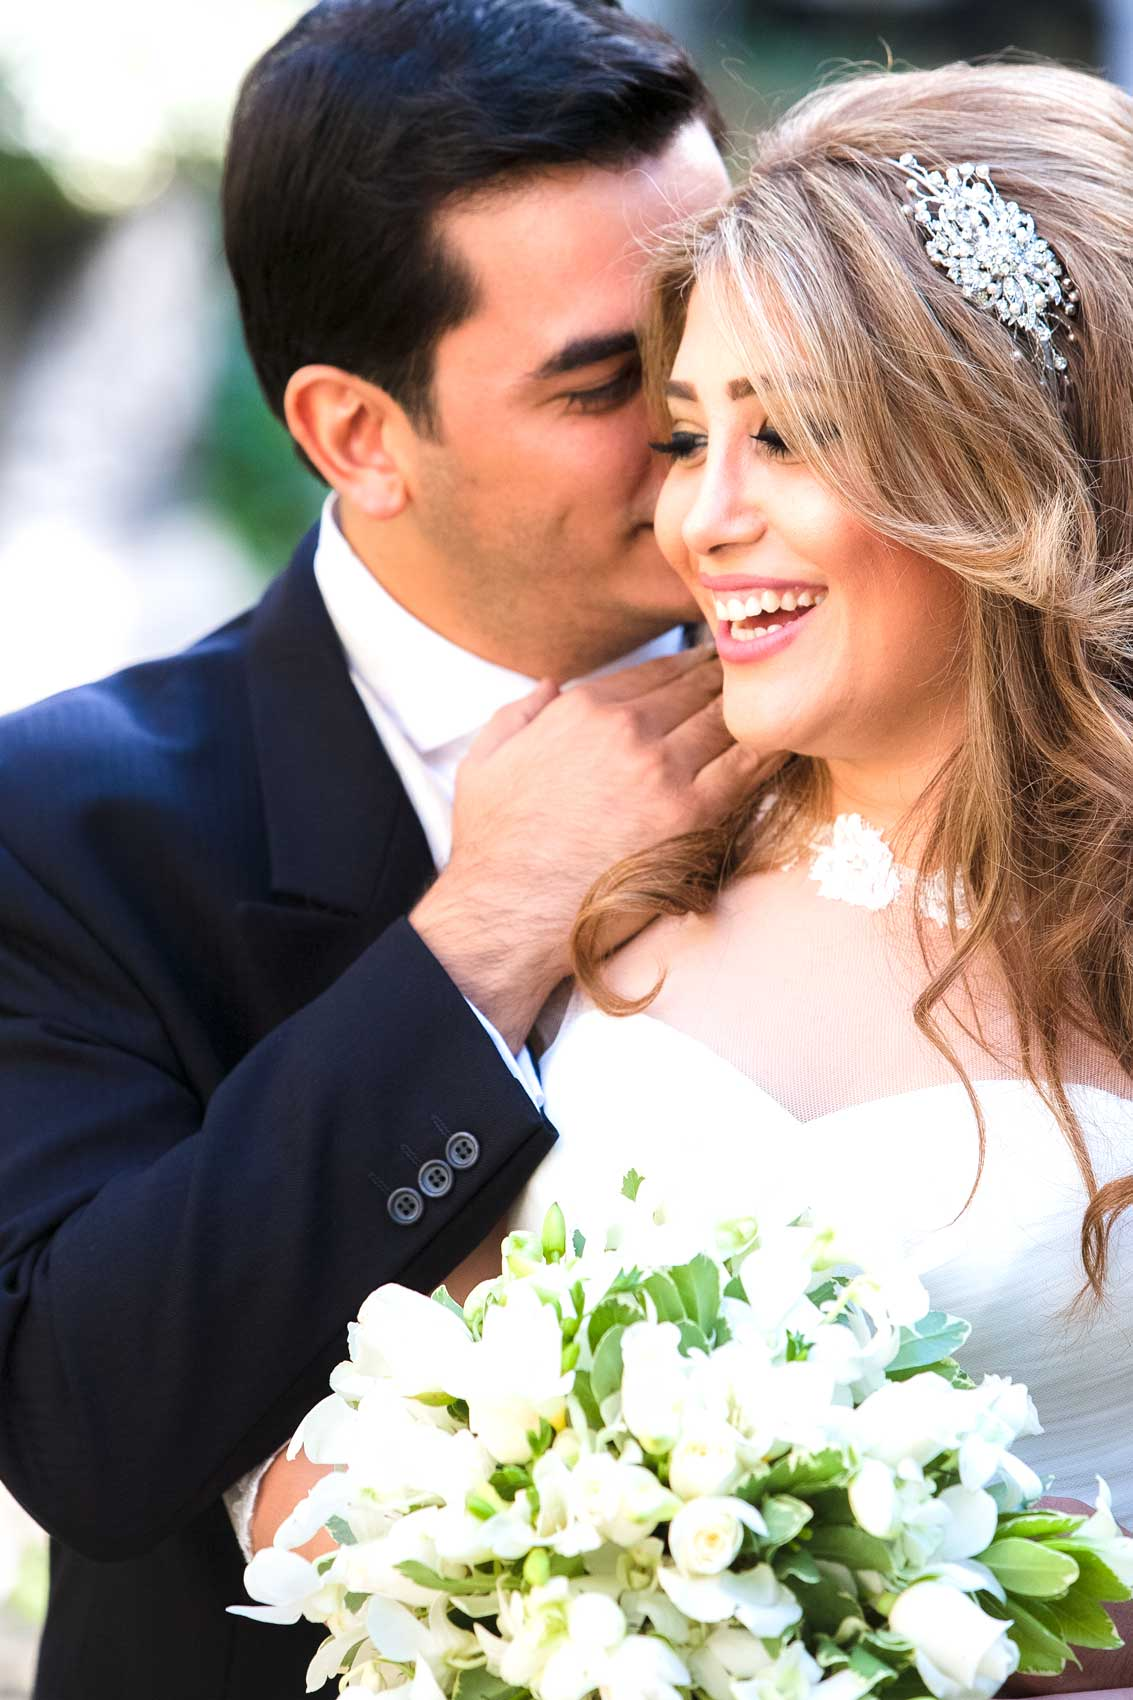 Drapers Hall Society Wedding Photography